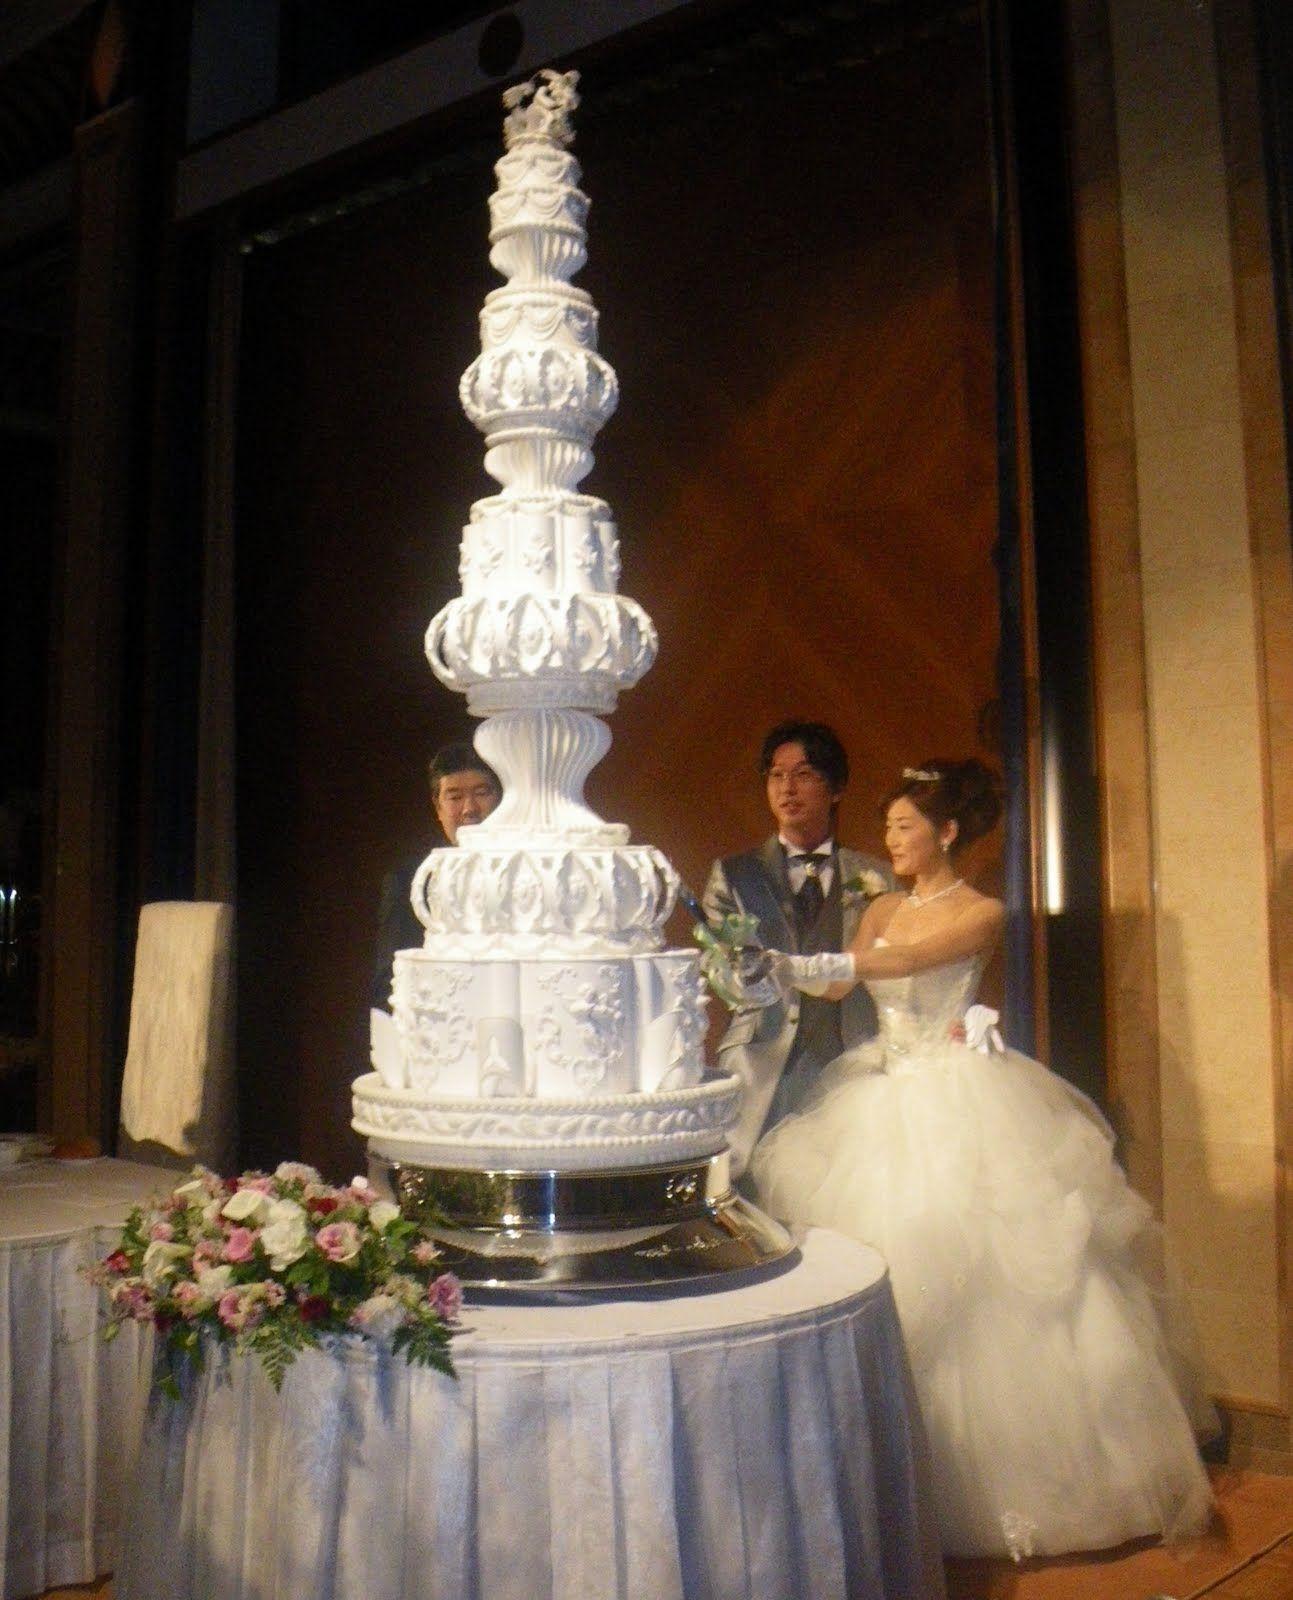 Gigantic Wedding Cakes  Cakes Torta Bodas Super Tortas giant cakes